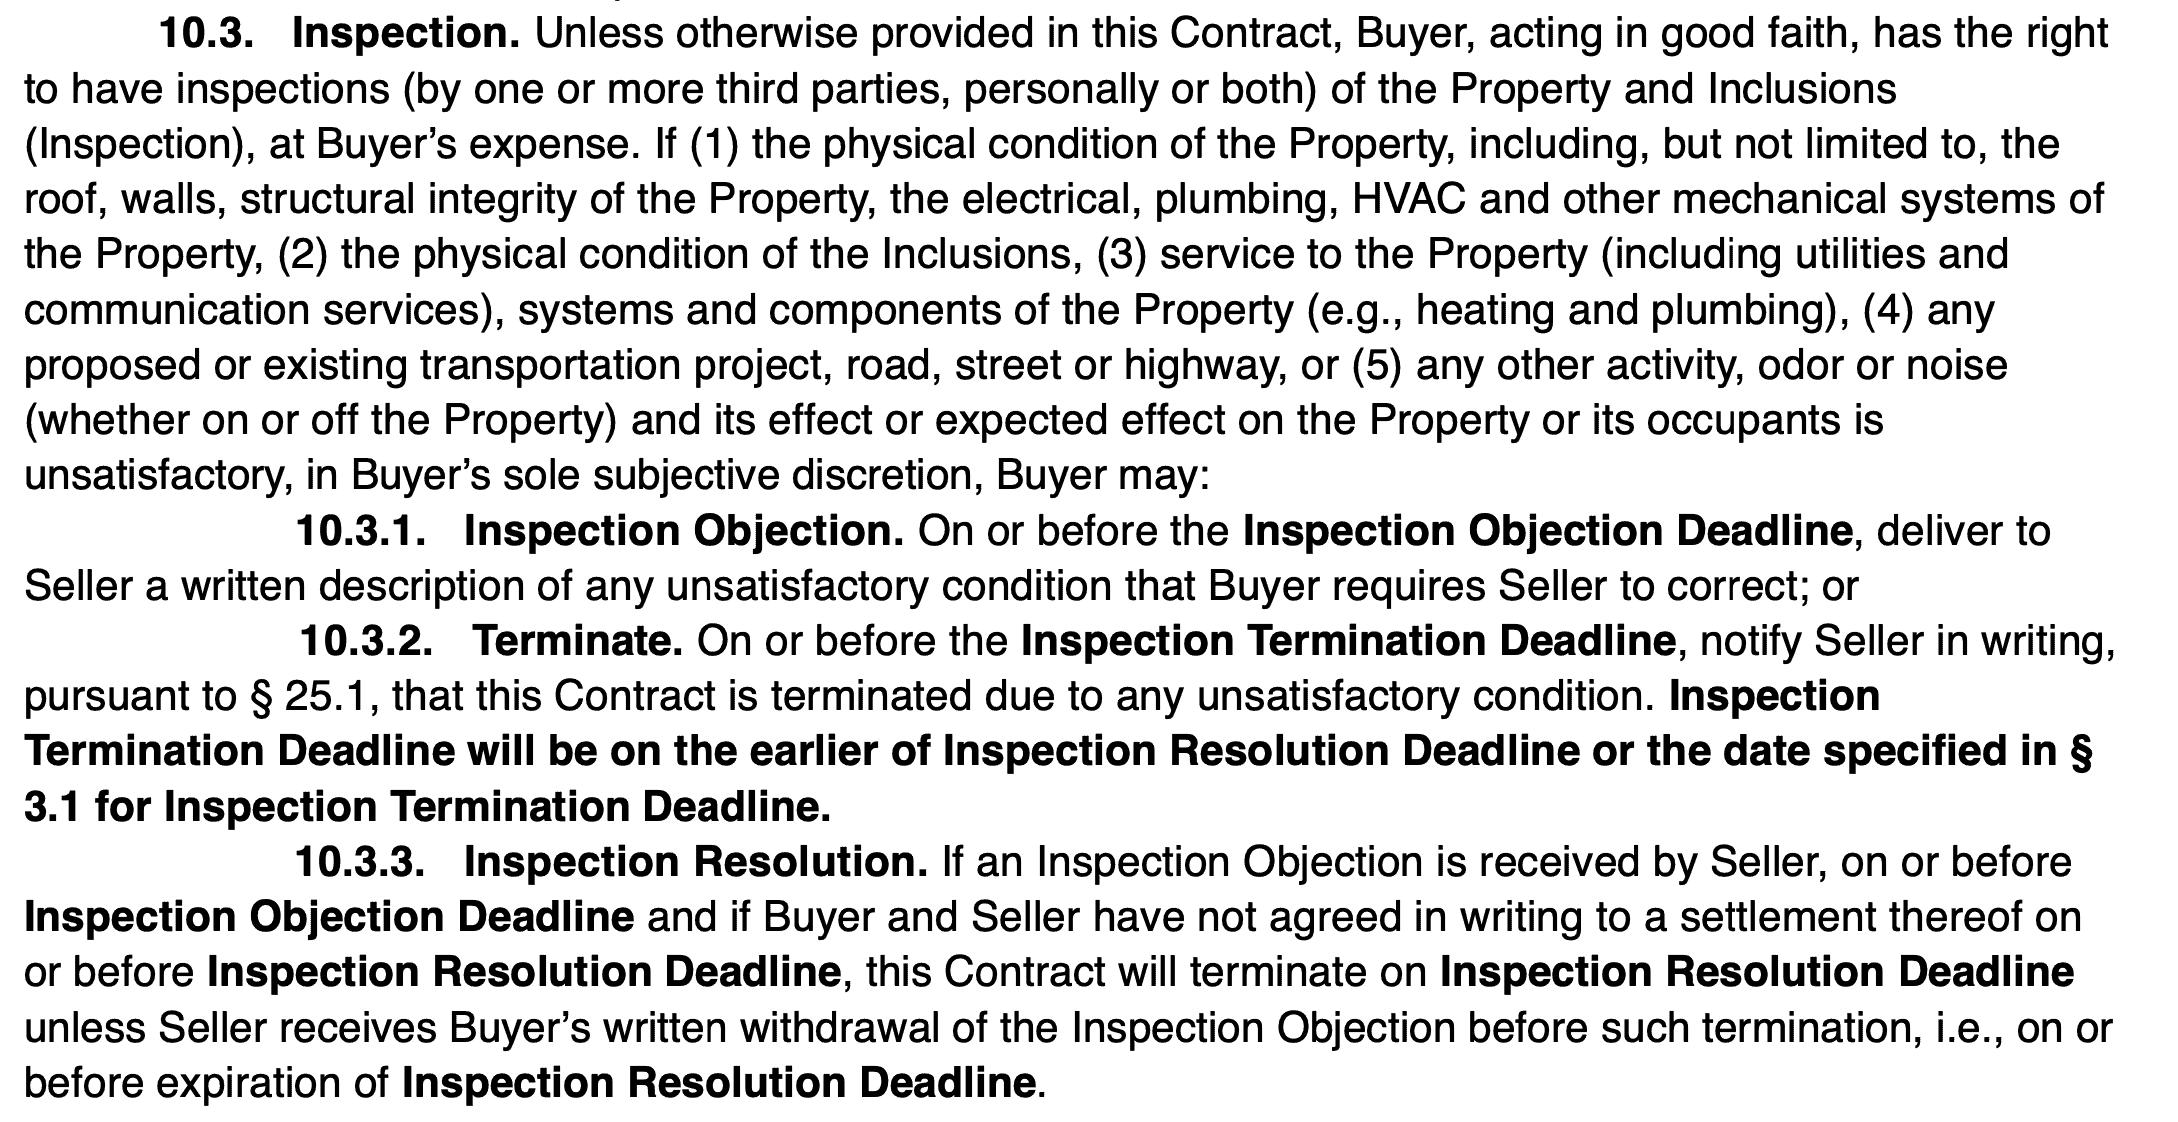 Colorado springs real estate inspection clause